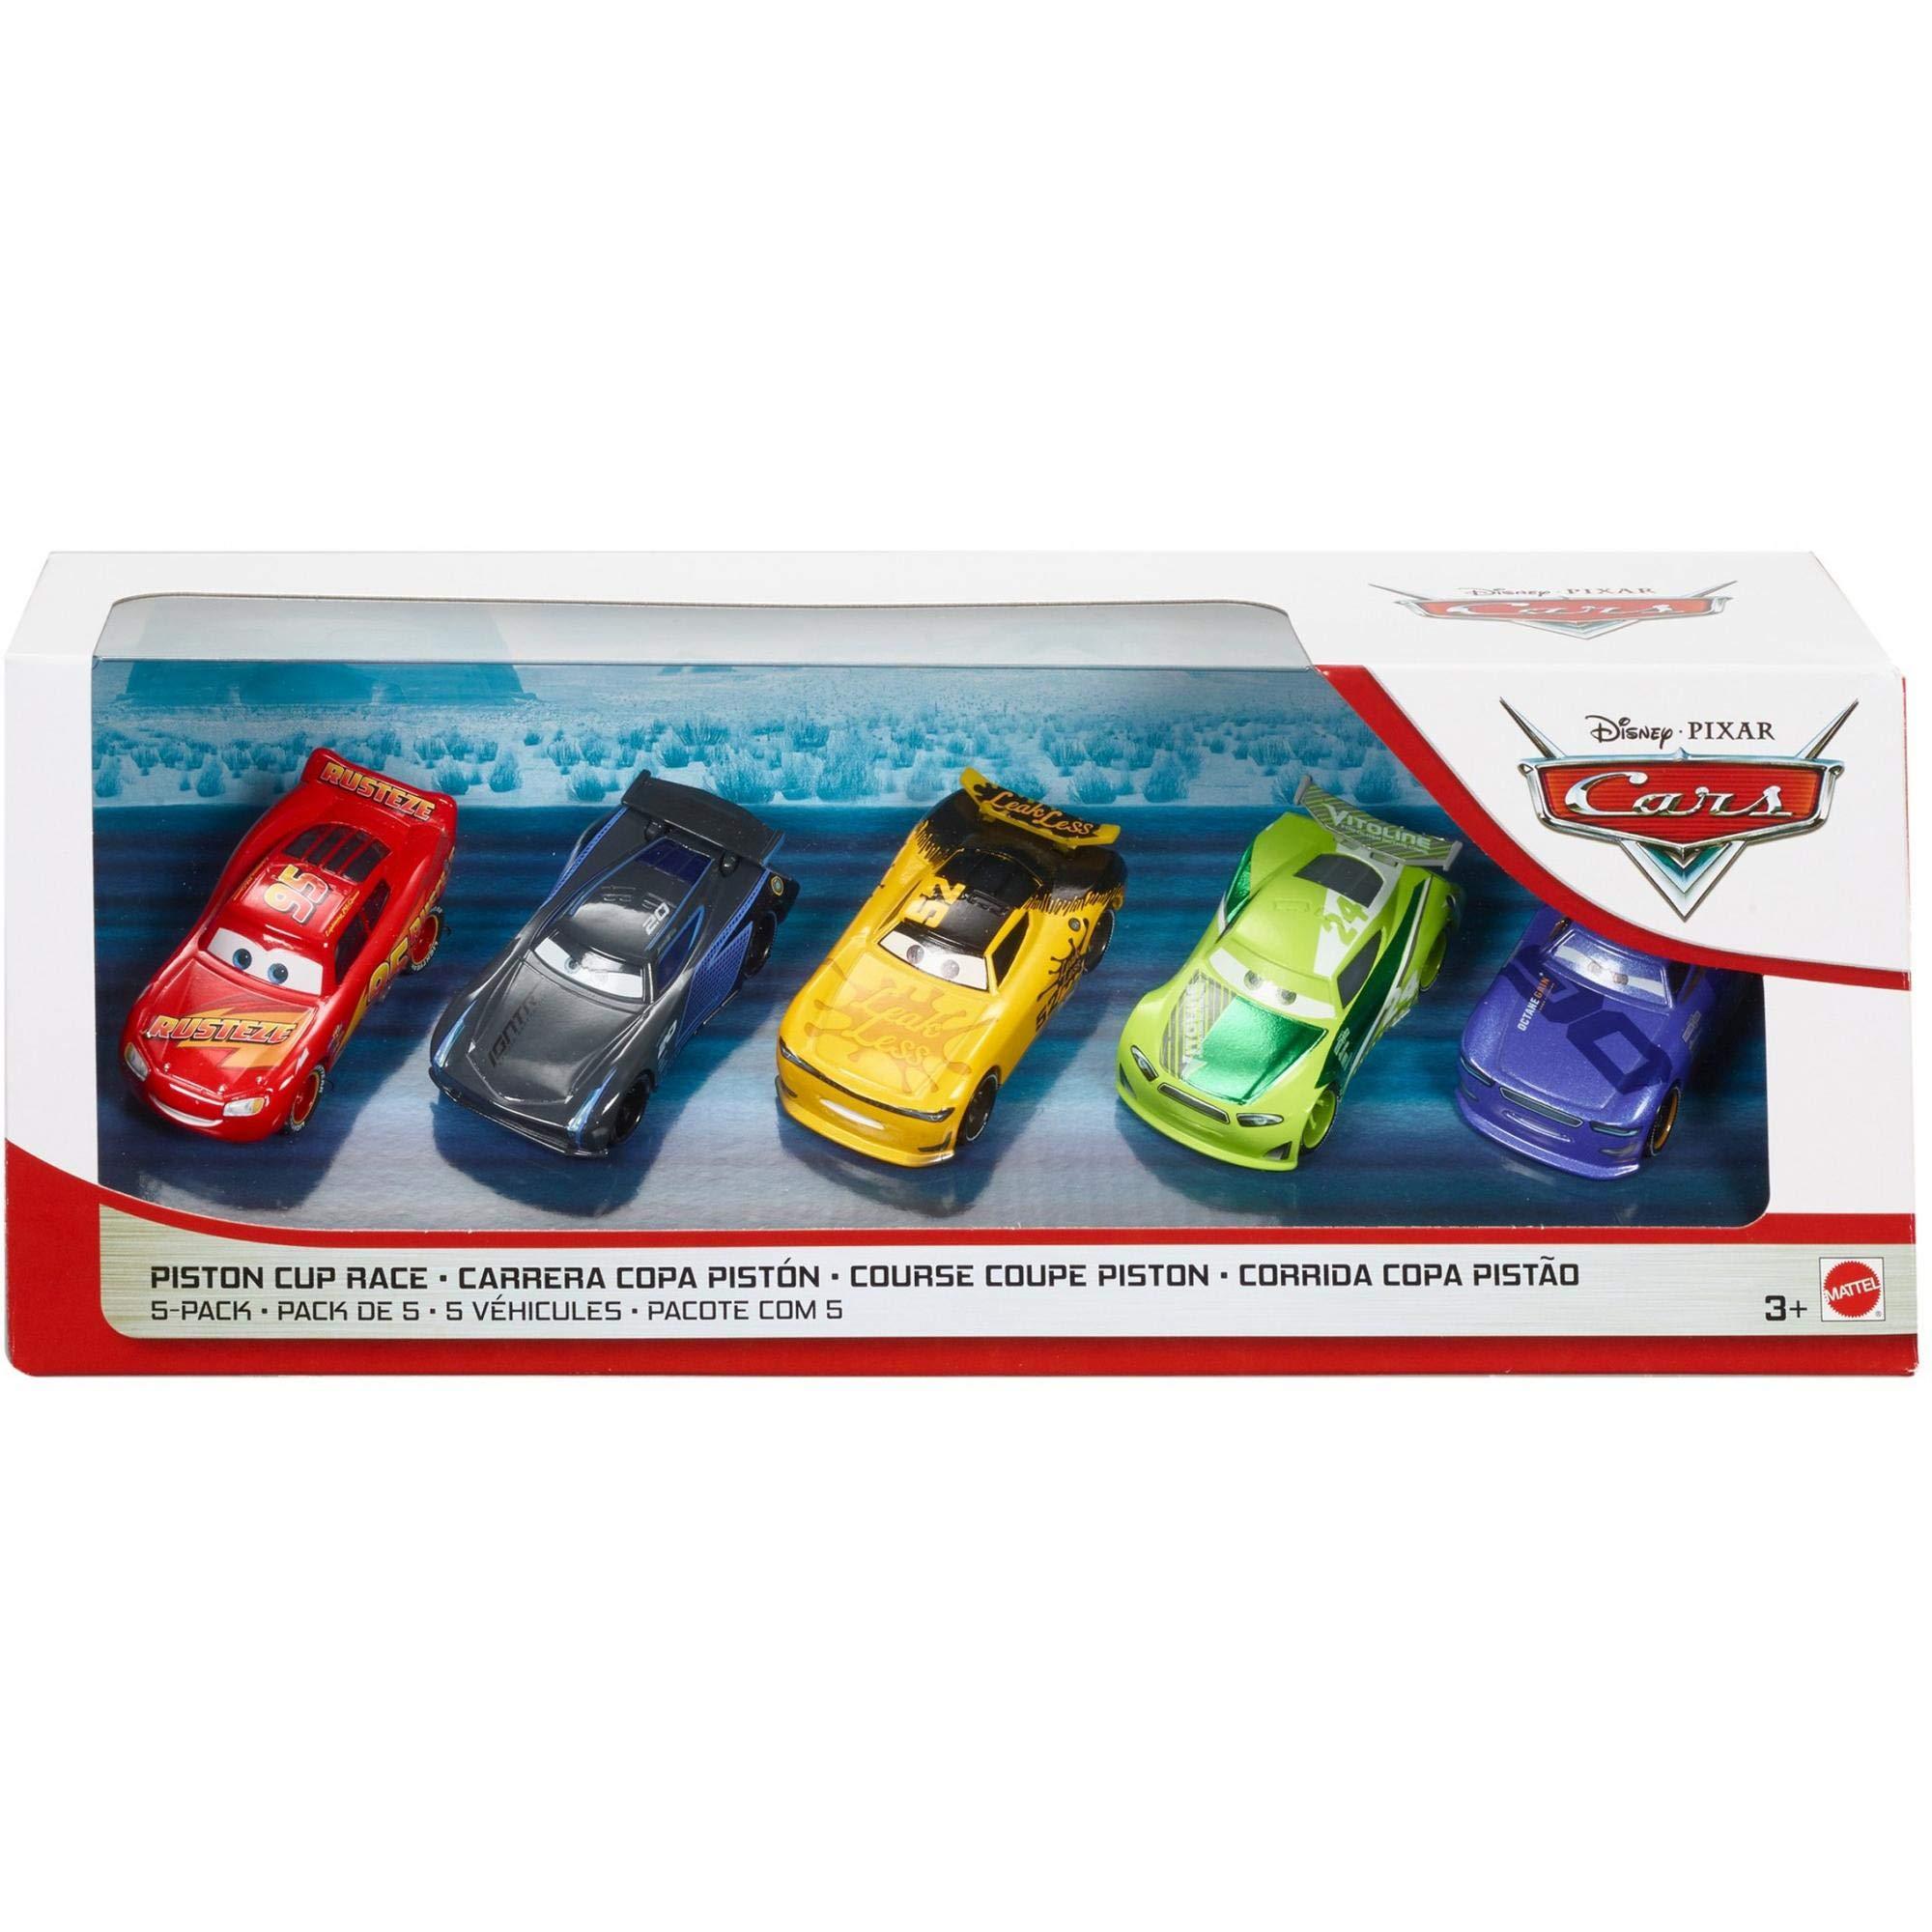 Disney Pixar Cars 3 Chase Racelott Next Gen Mattel 1.55 Scale Brand New Loose